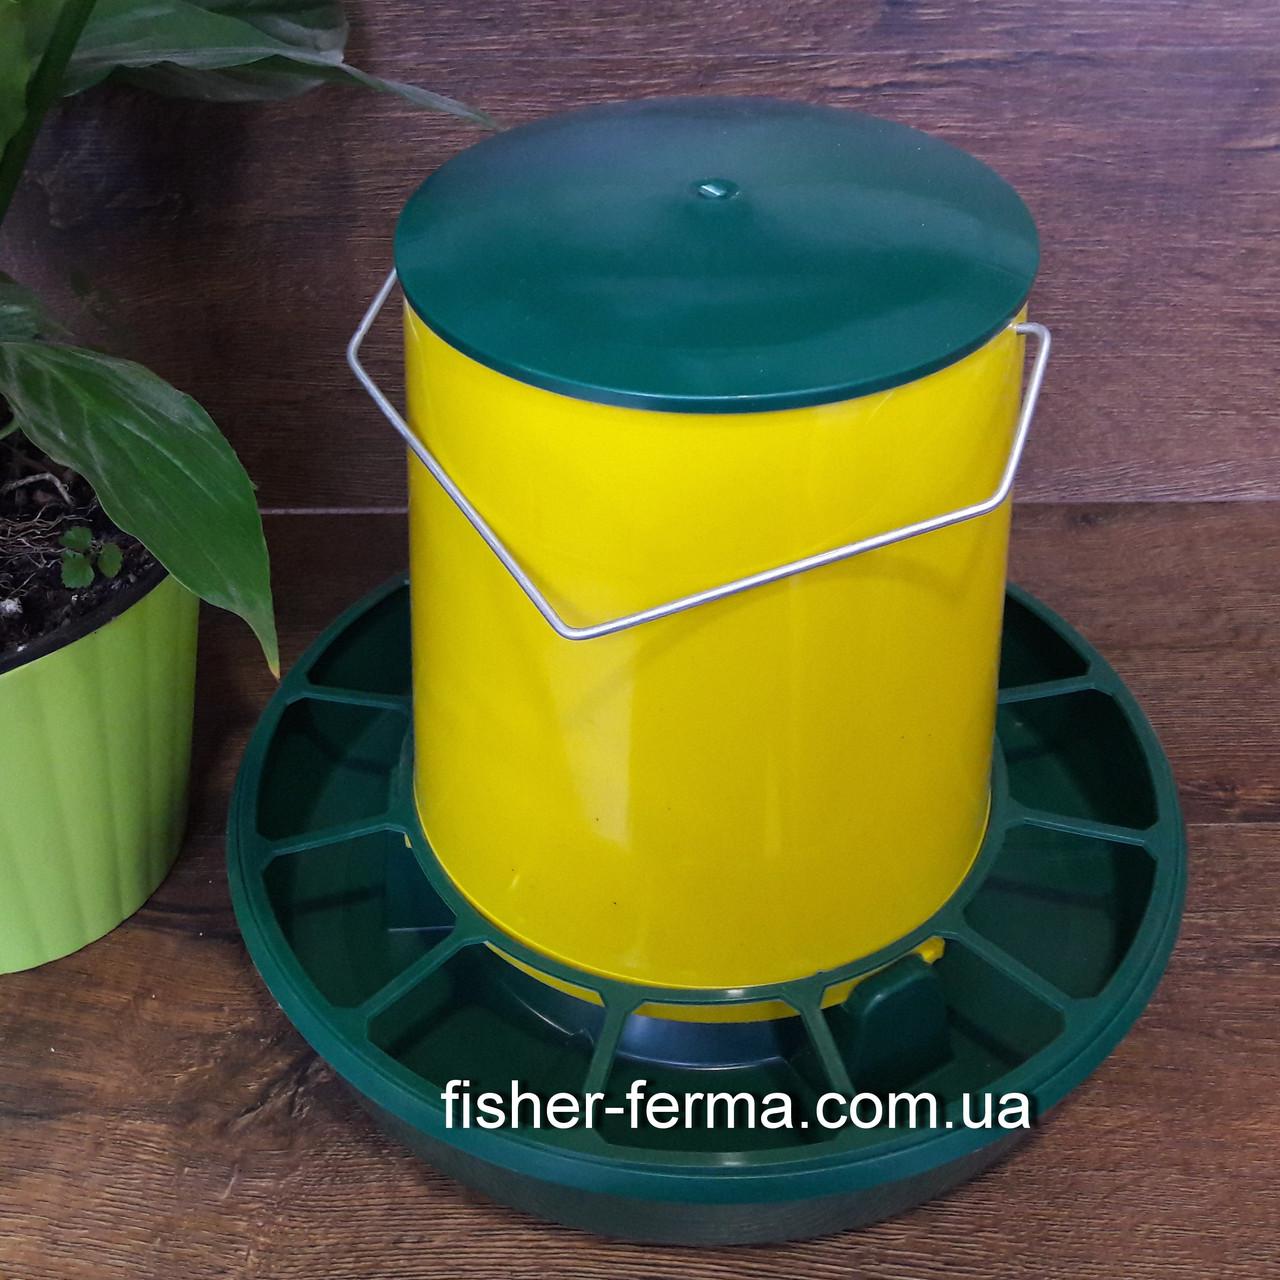 Кормушка желтая для домашней птицы объем 6 л